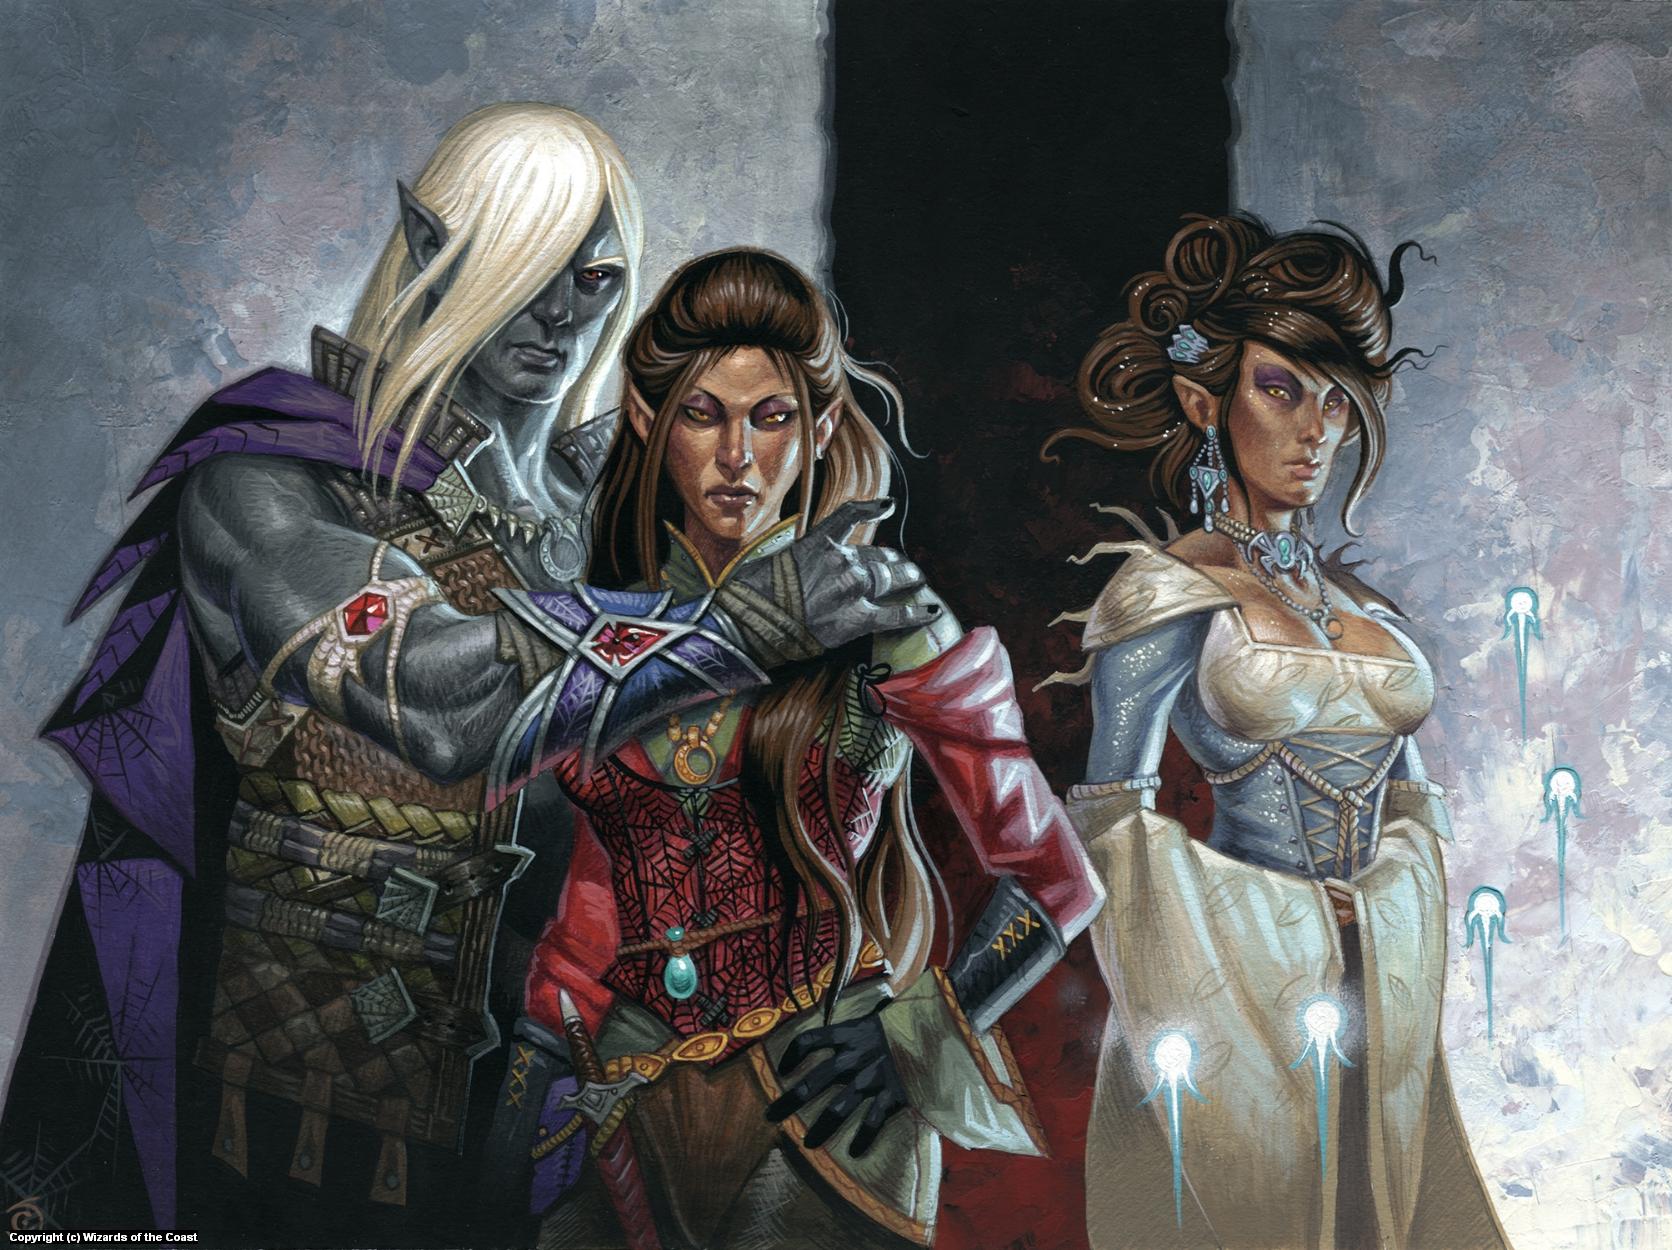 The Elves of Ardril Ereldain Artwork by Chris Seaman